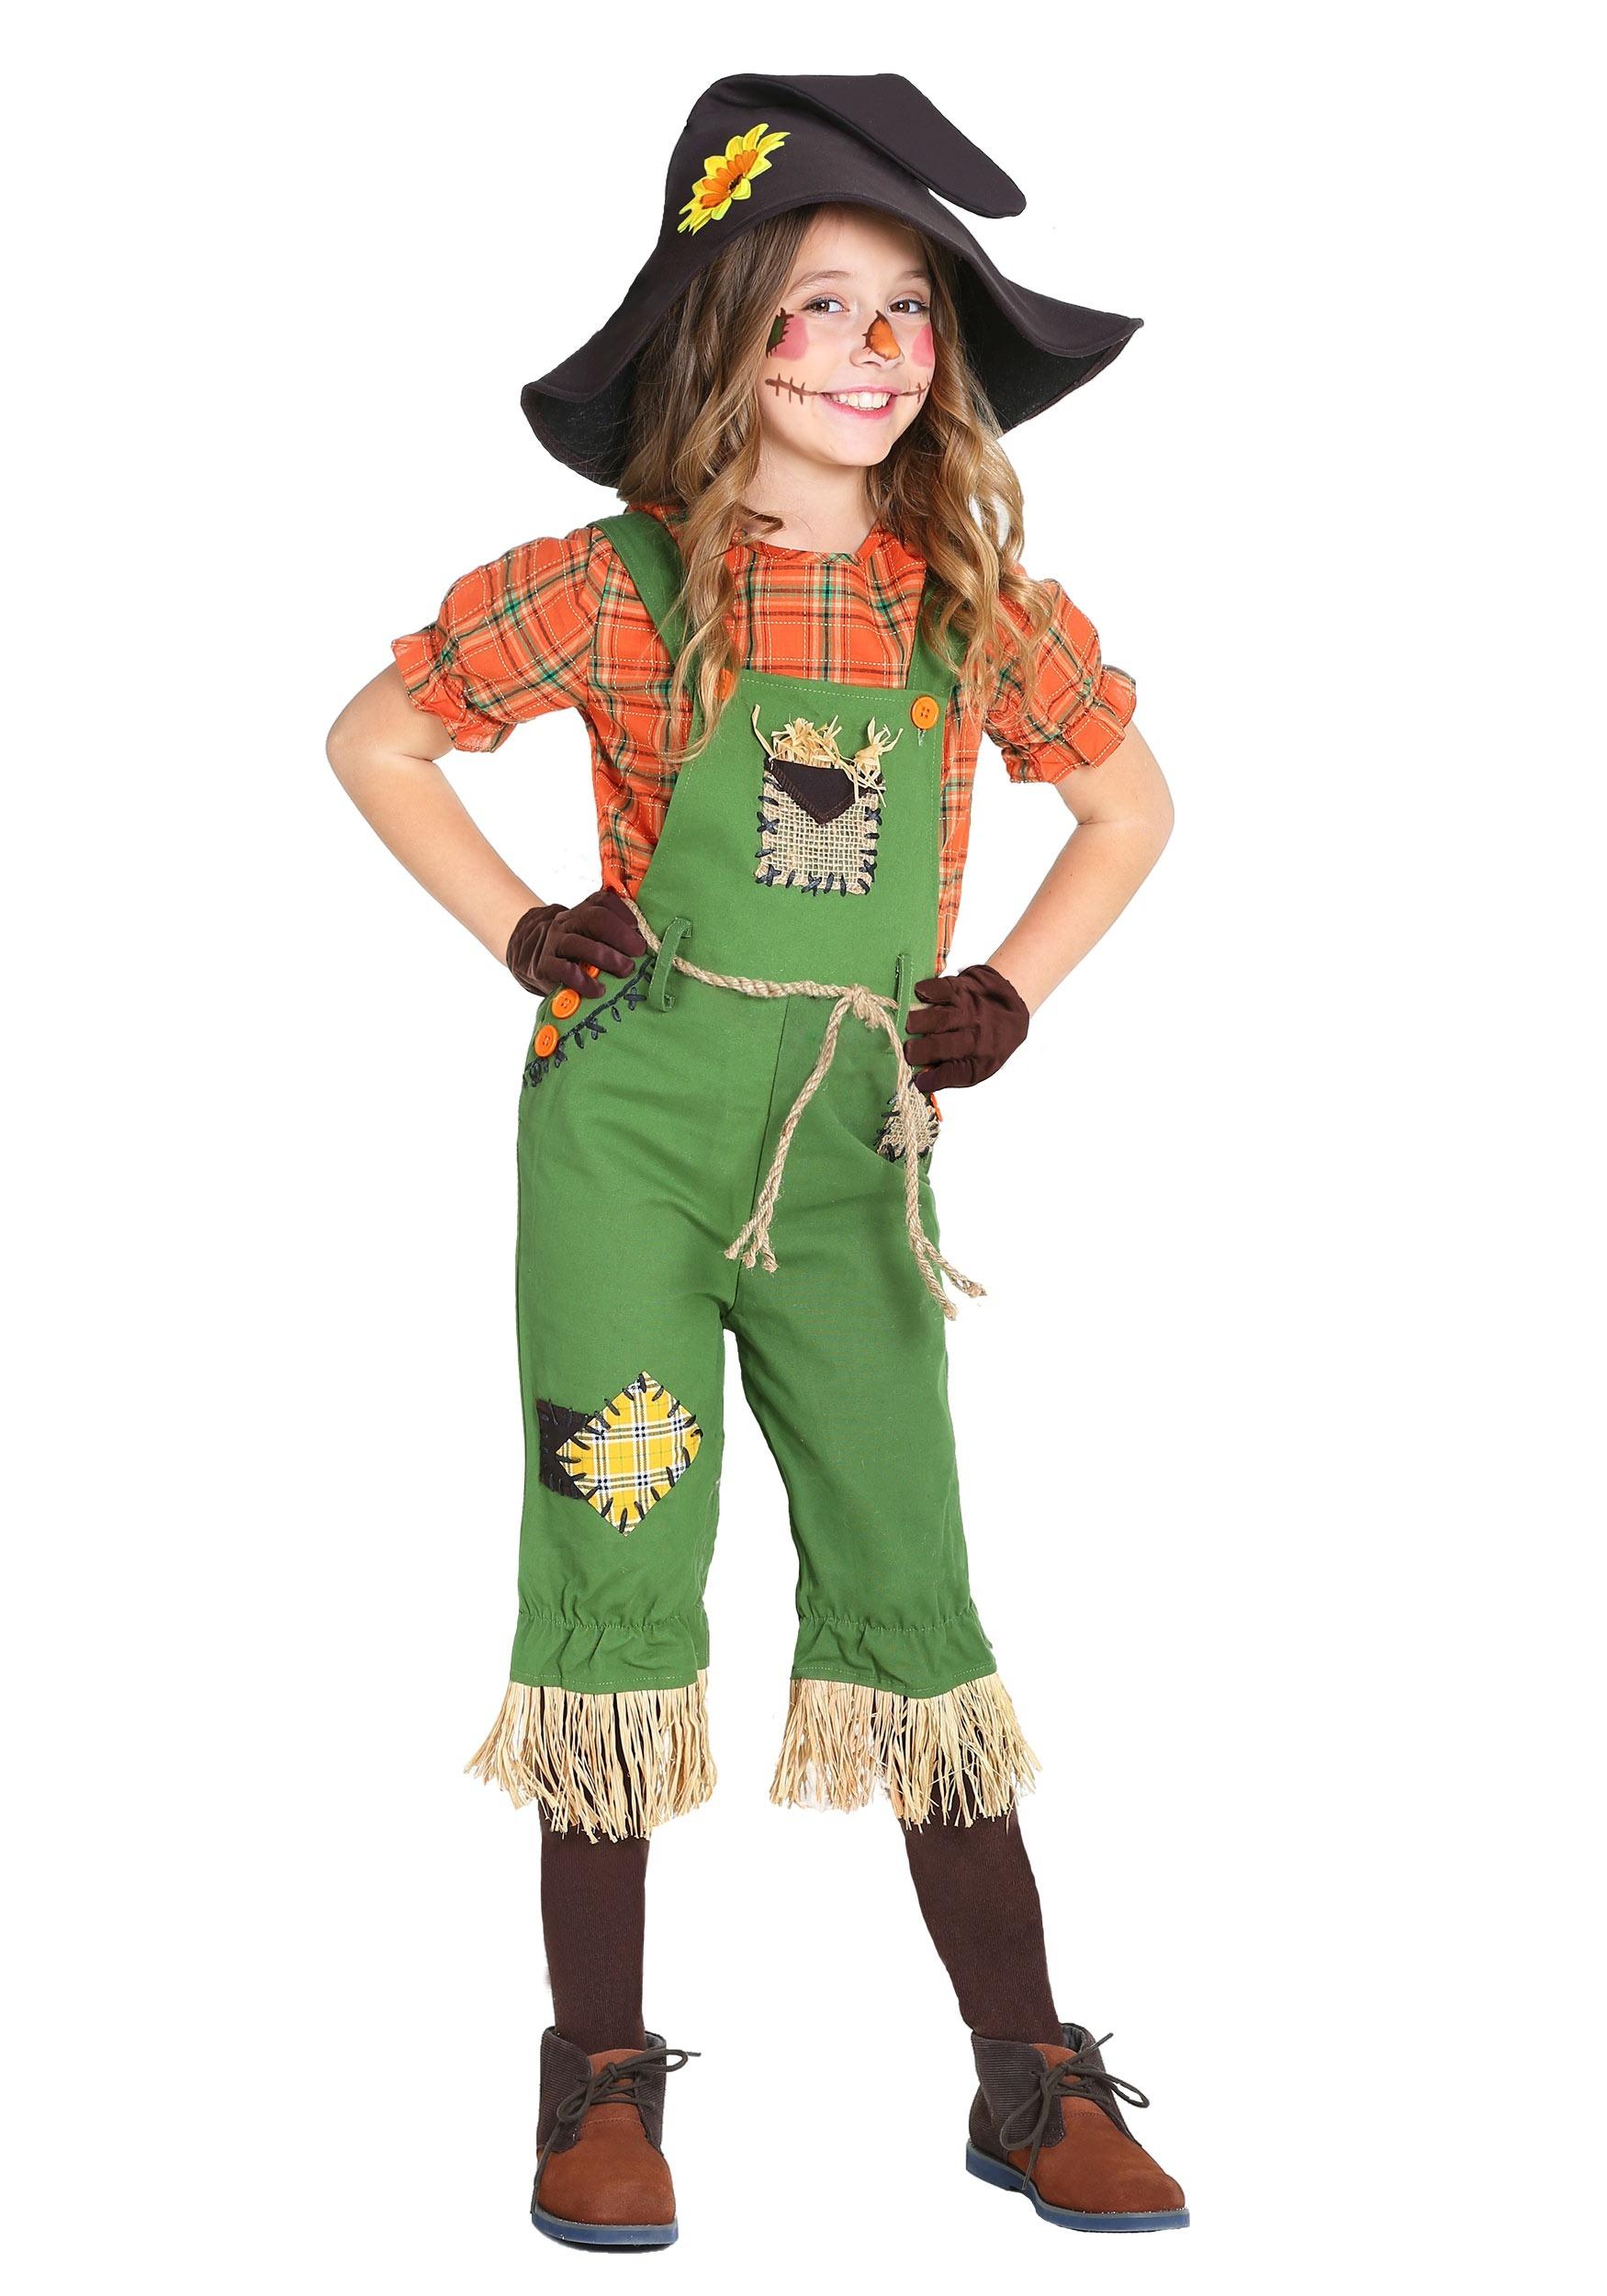 Wonderful Wizard of Oz Costumes - HalloweenCostumes.com